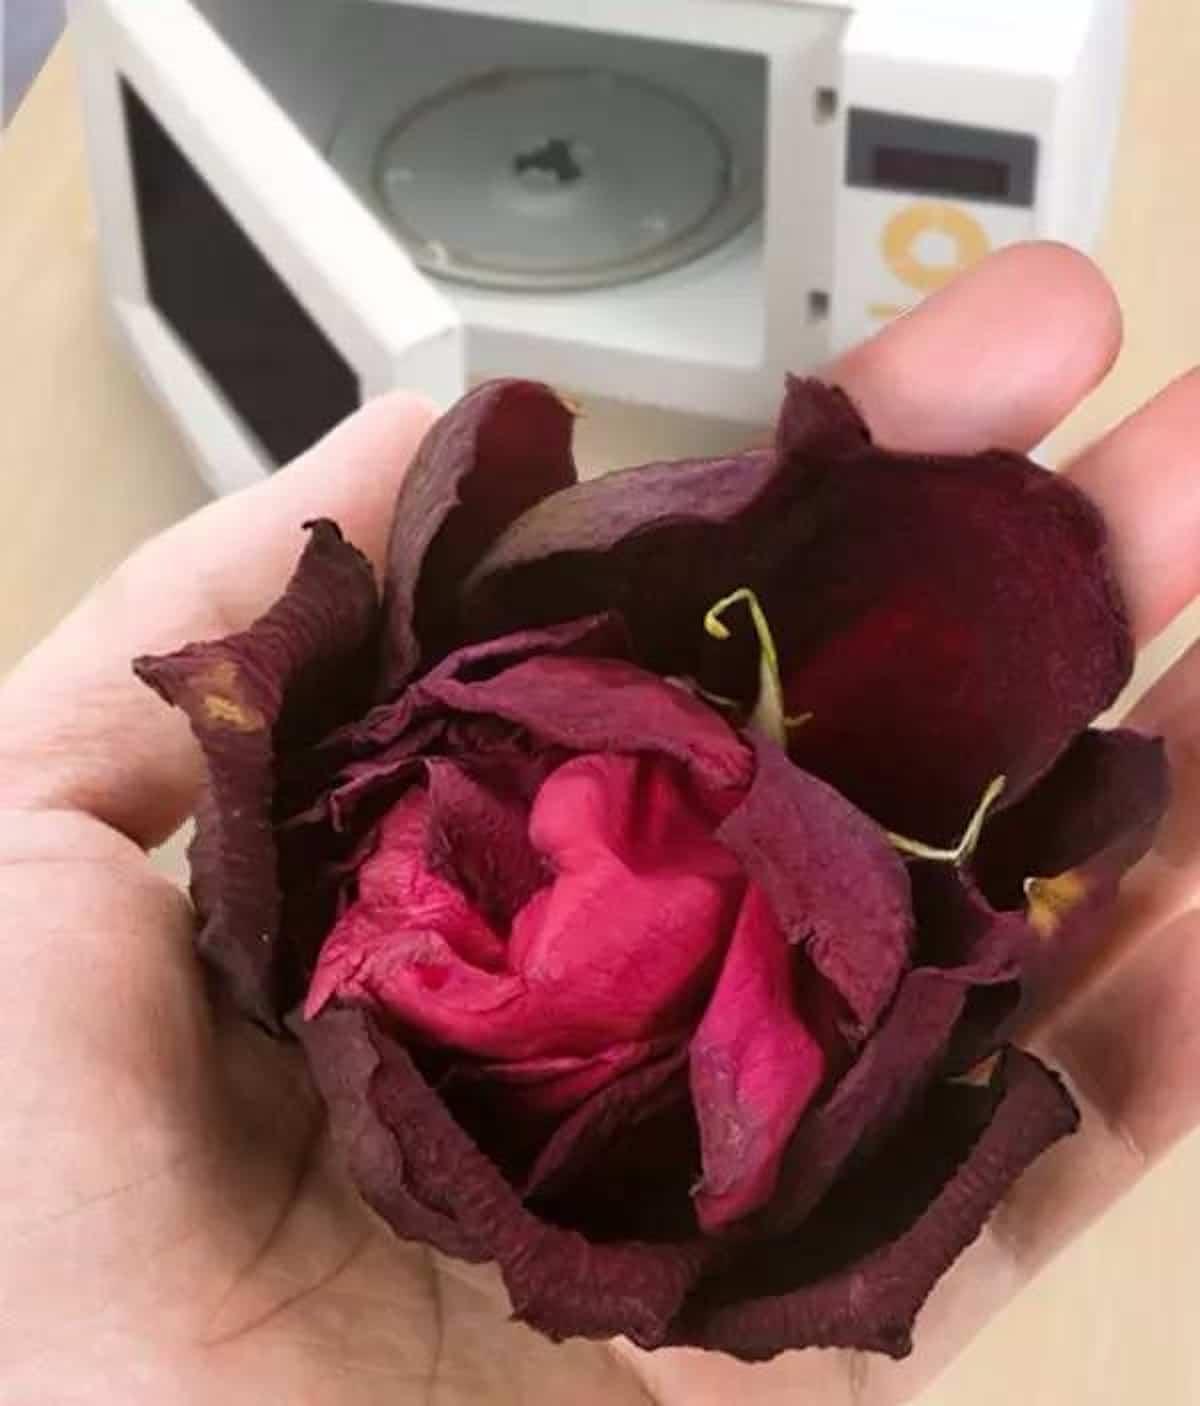 descubre las diversas tecnicas para secar flores en casa 4